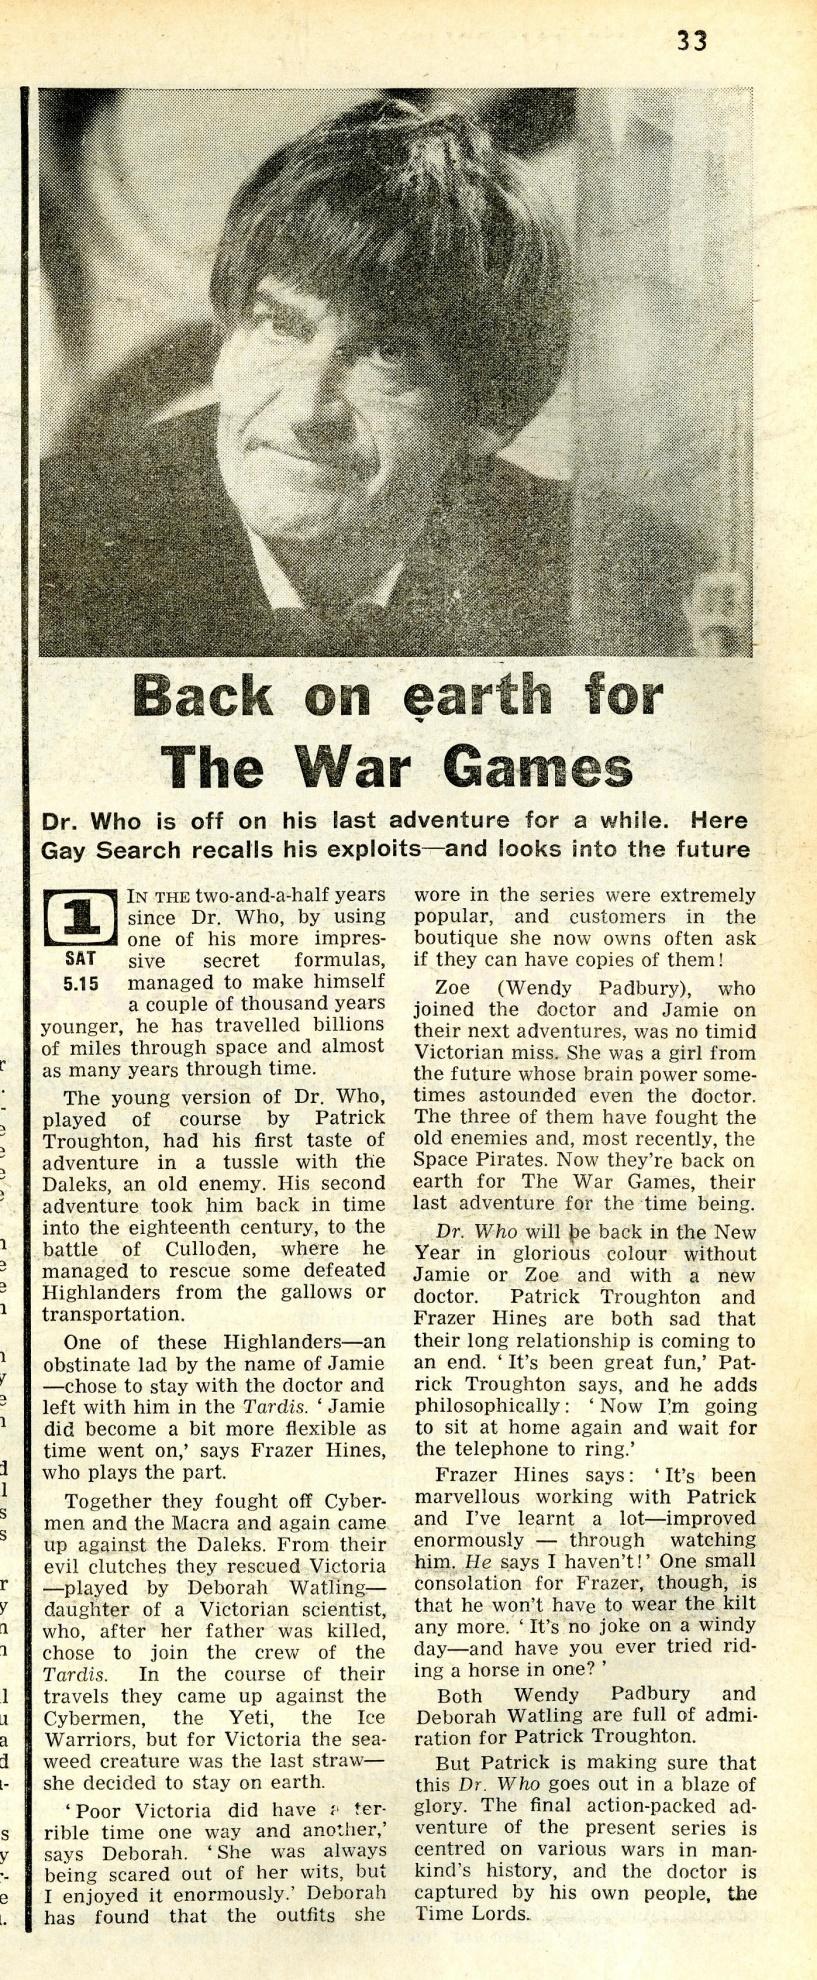 Radio Times, 19-25 April 1969